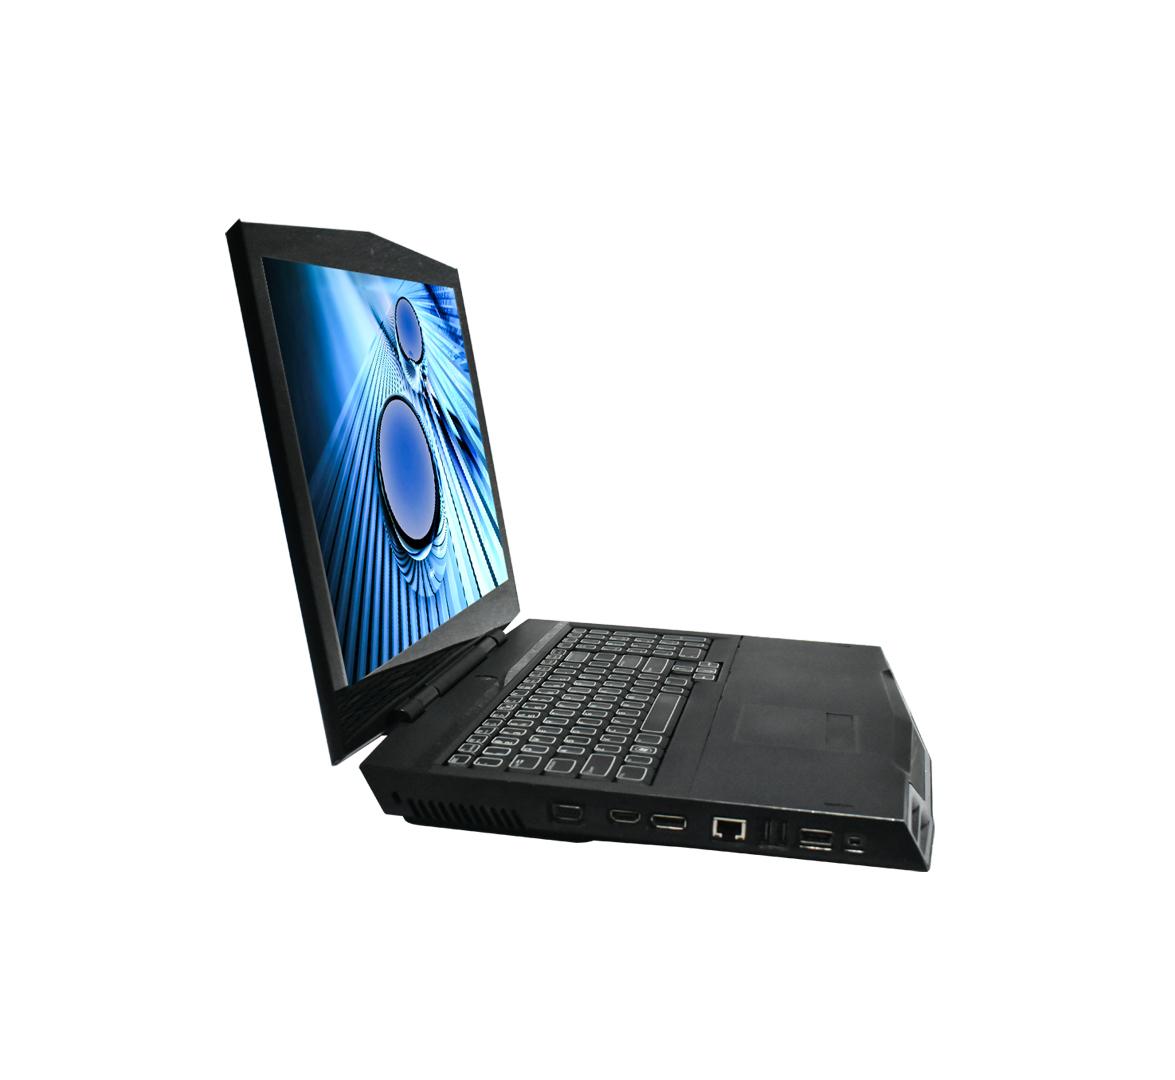 Alienware Gaming Laptop, Intel Core i7-M620 CPU, 8GB DDR3 SODIMM RAM, 750GB SATA 2.5 Hard, 17 inch Display, Windows 10 Pro (Refurbished)